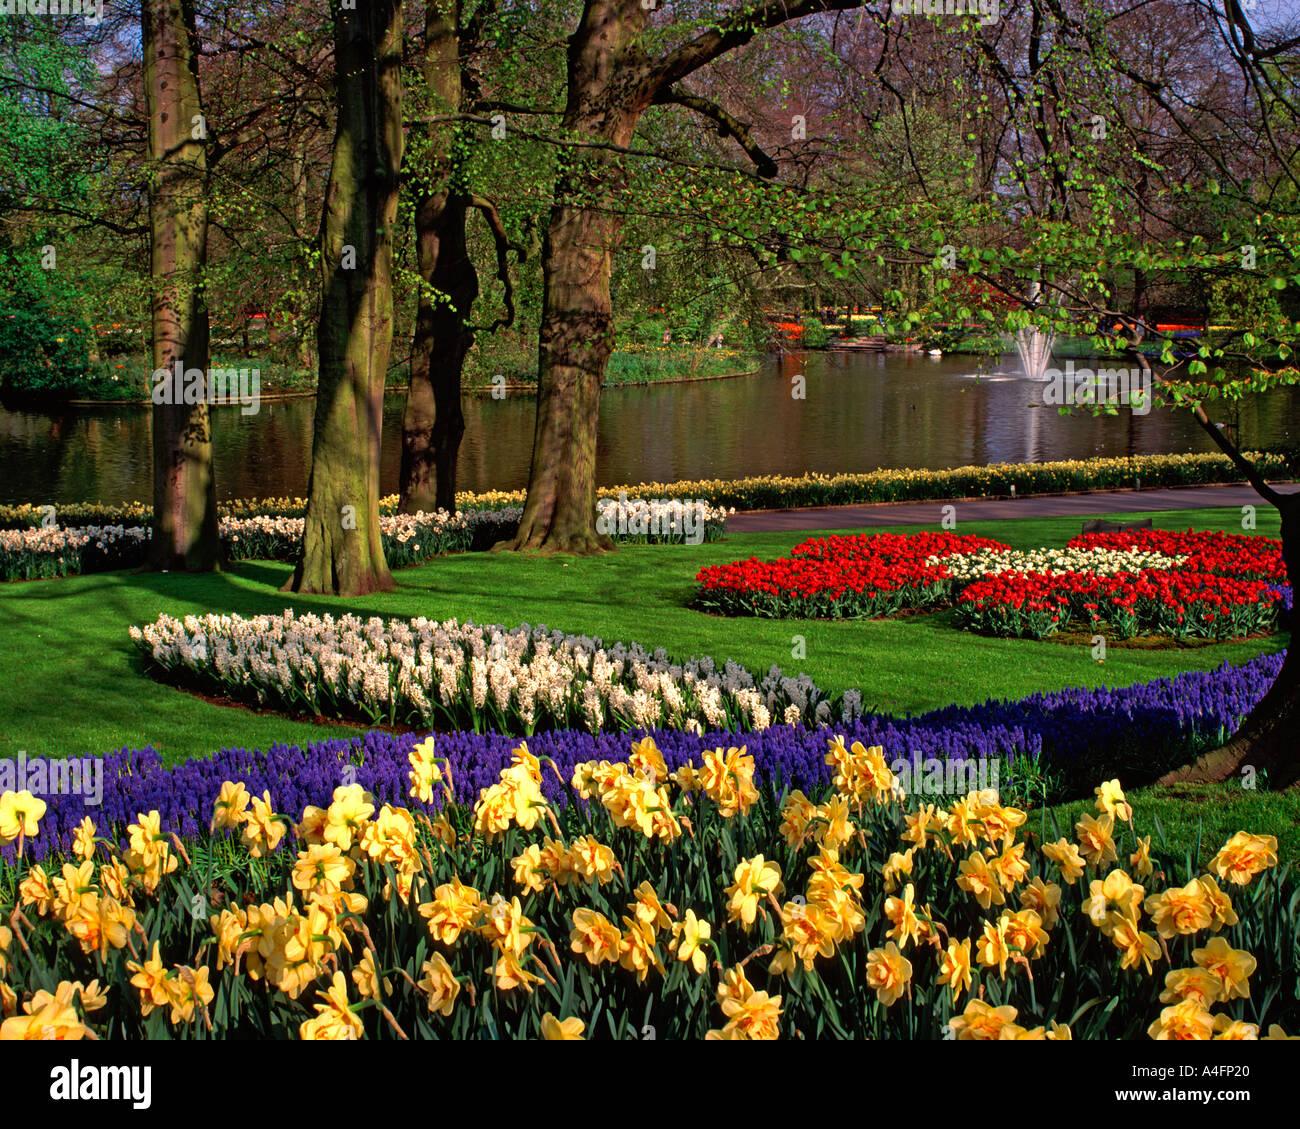 Keukenhof Gardens, Lisse, Holland Stock Photo: 3602975 - Alamy